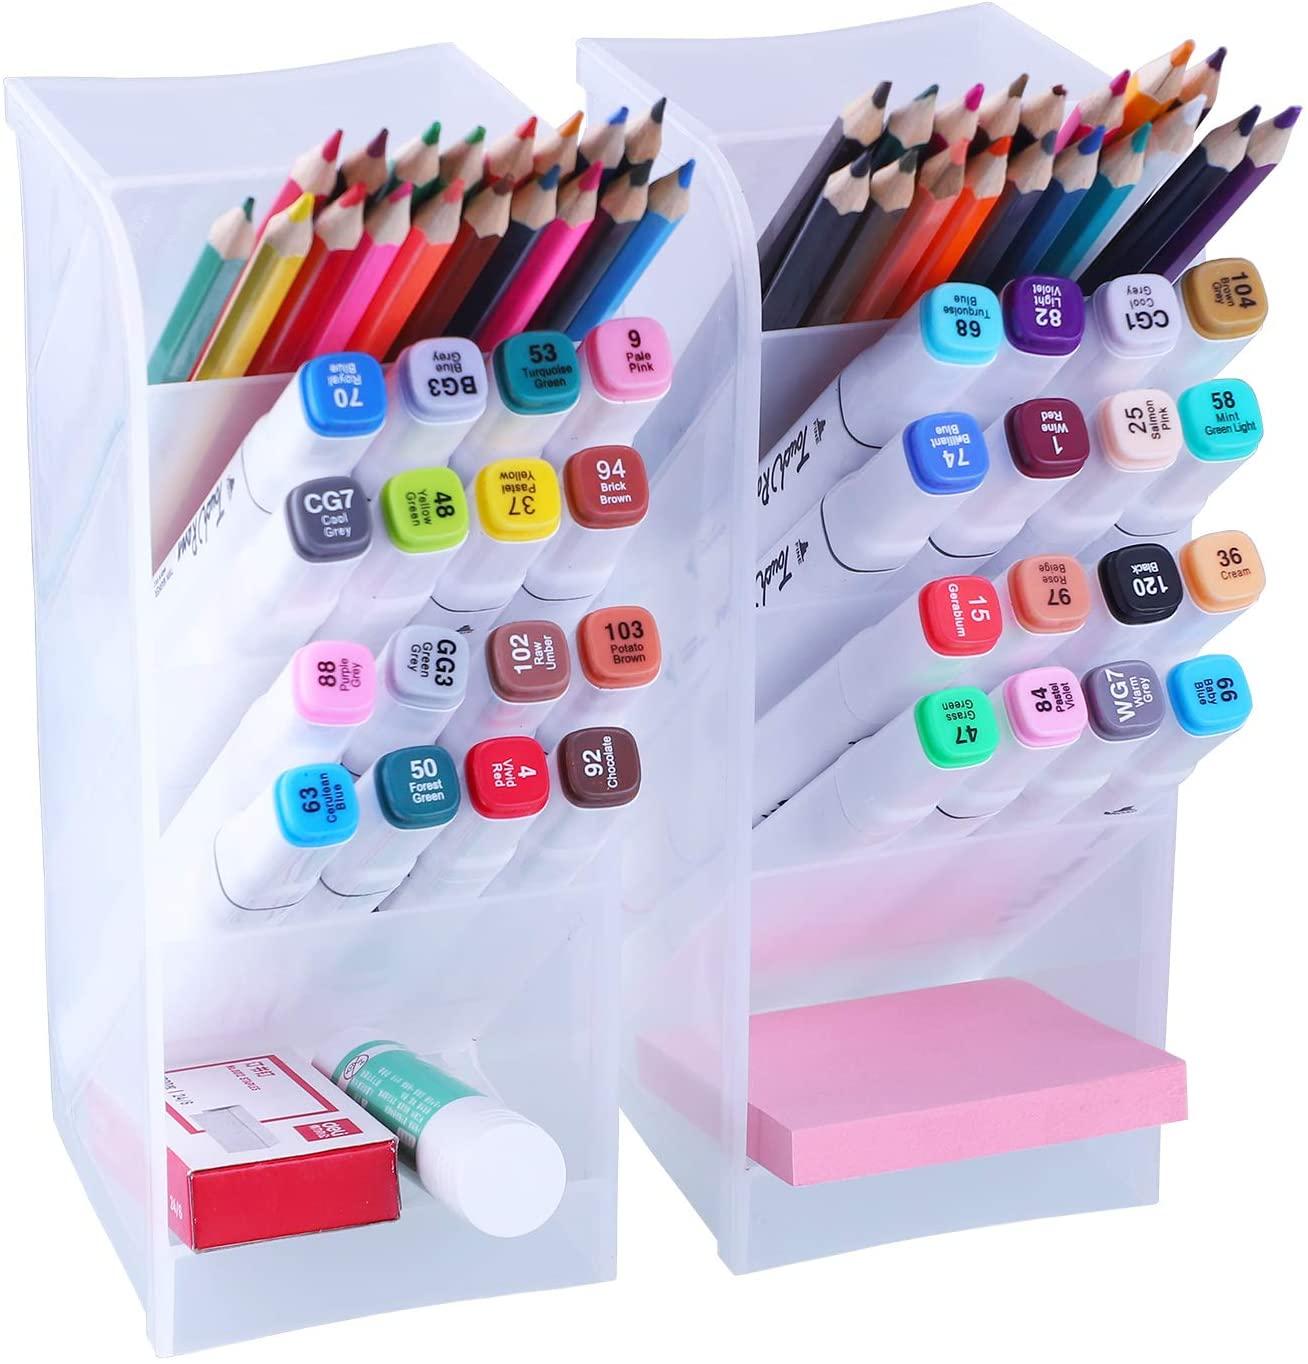 Antner 2pcs Desk Organizer High Capacity Pen Holder Desktop Storage Makeup Brushes Caddy for Office School Home Supplies, Translucent White Big Pen Holder